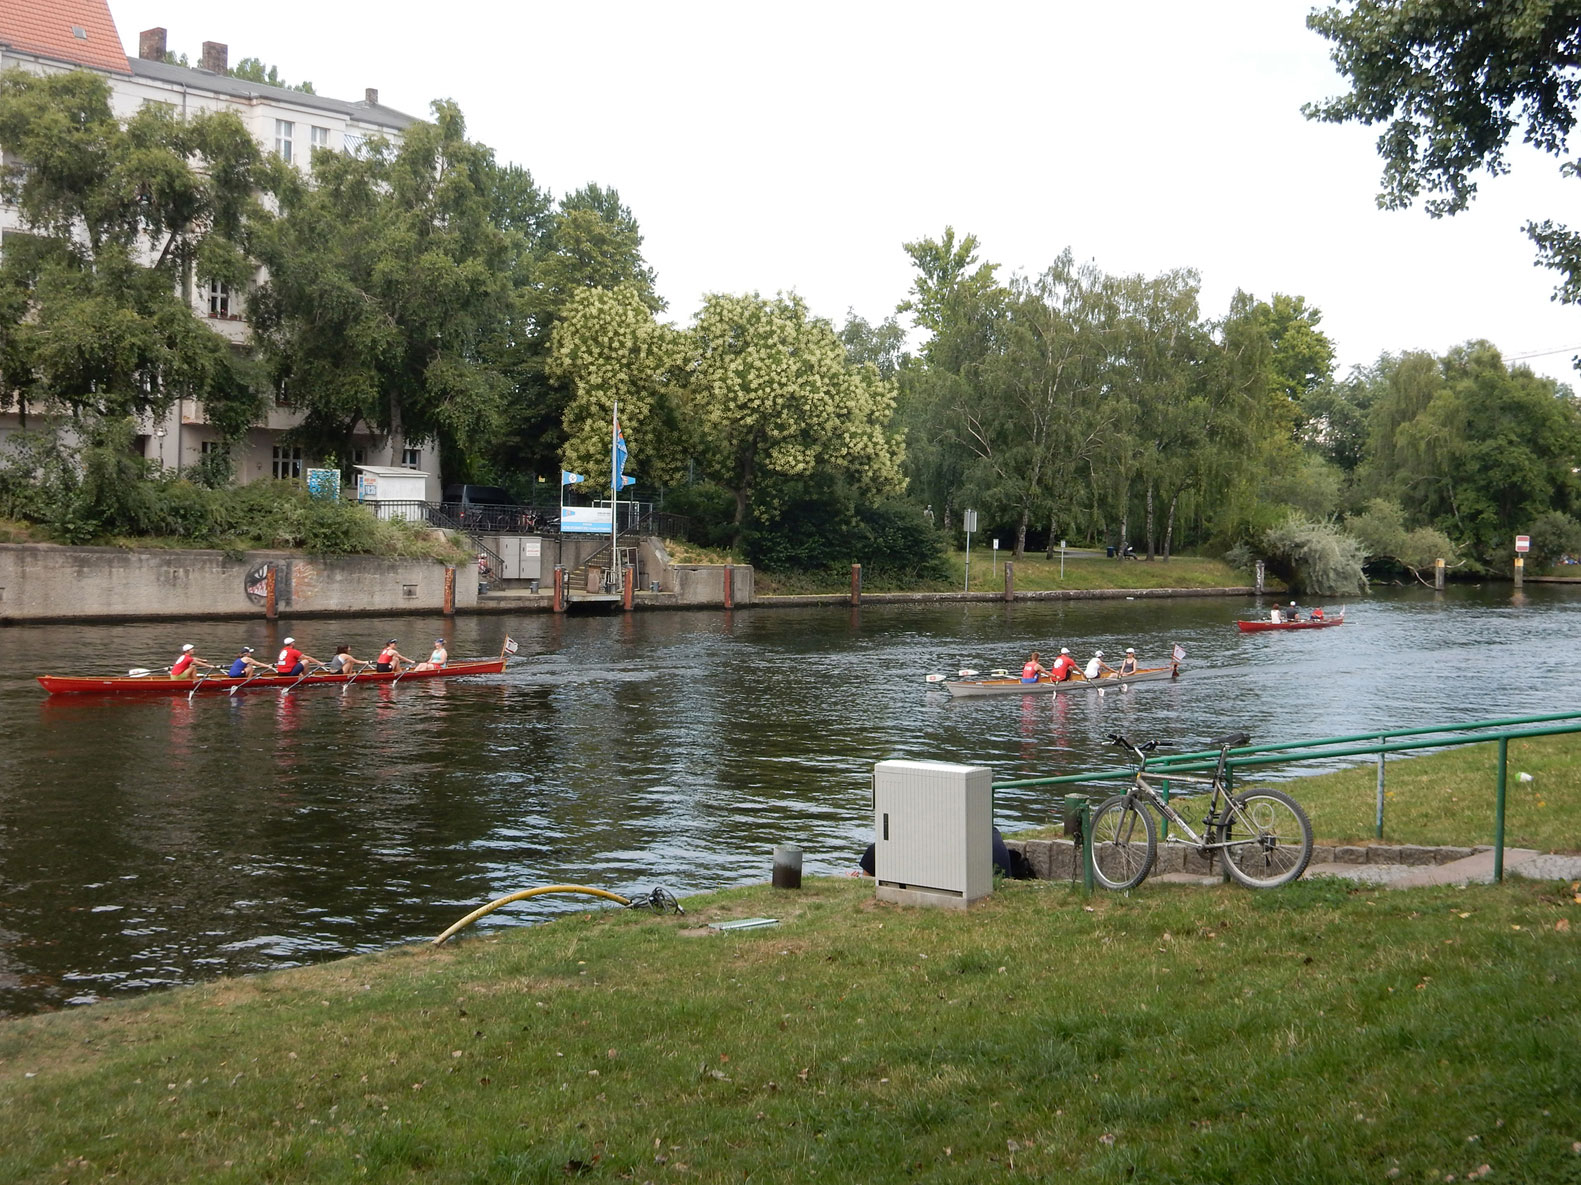 Radtour Grunewald nach Tempelhof